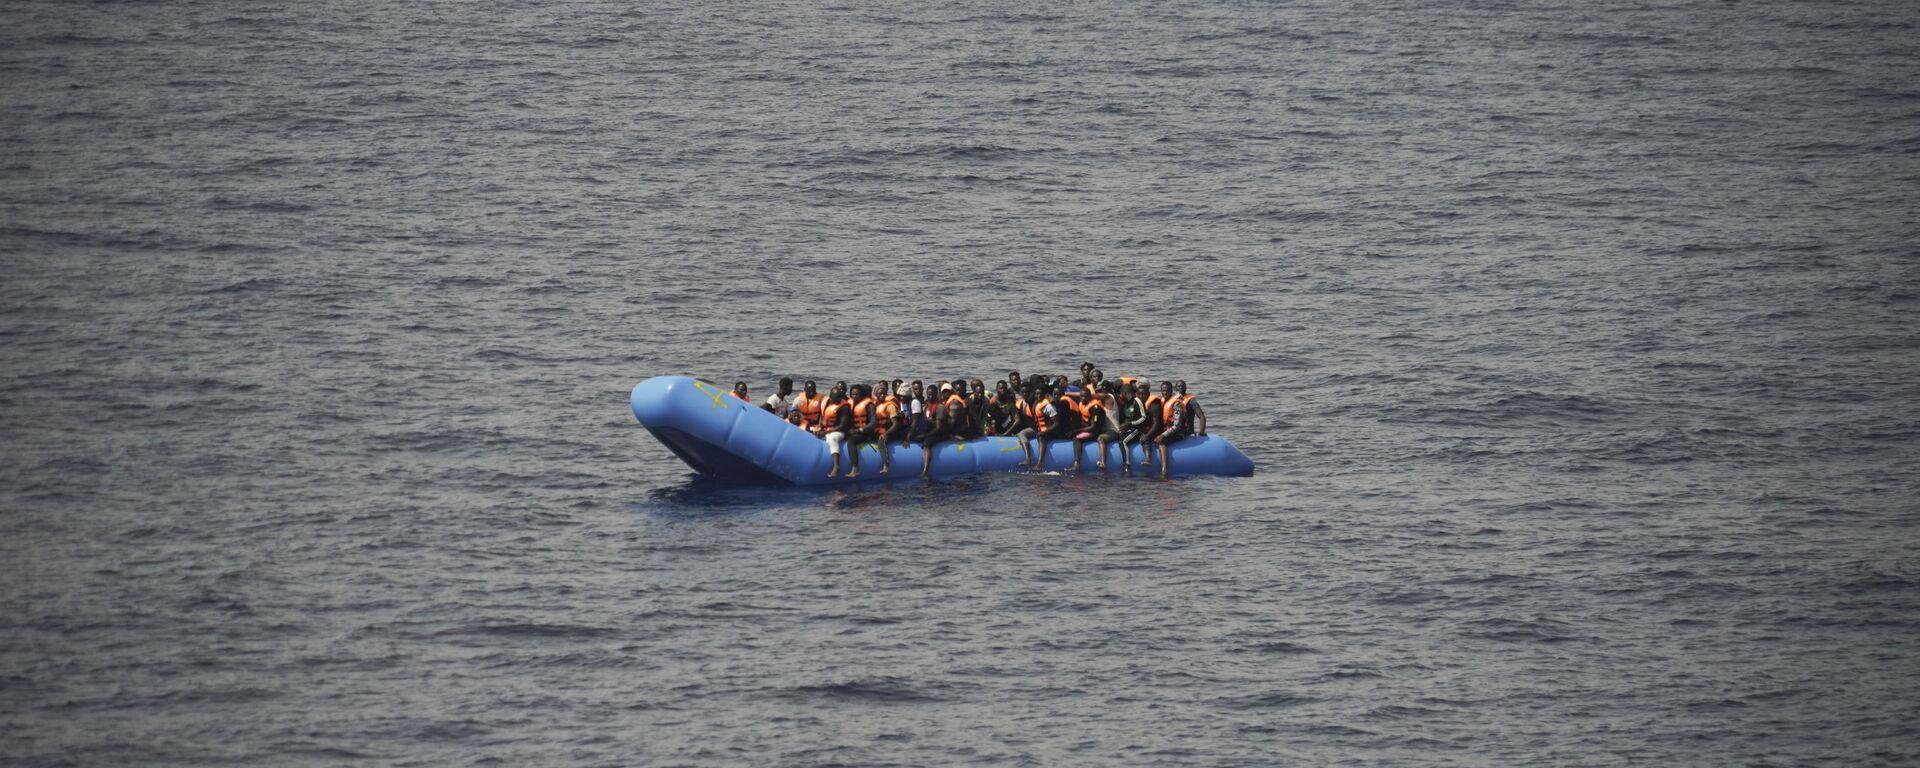 Migranti su una barca - Sputnik Italia, 1920, 16.08.2021